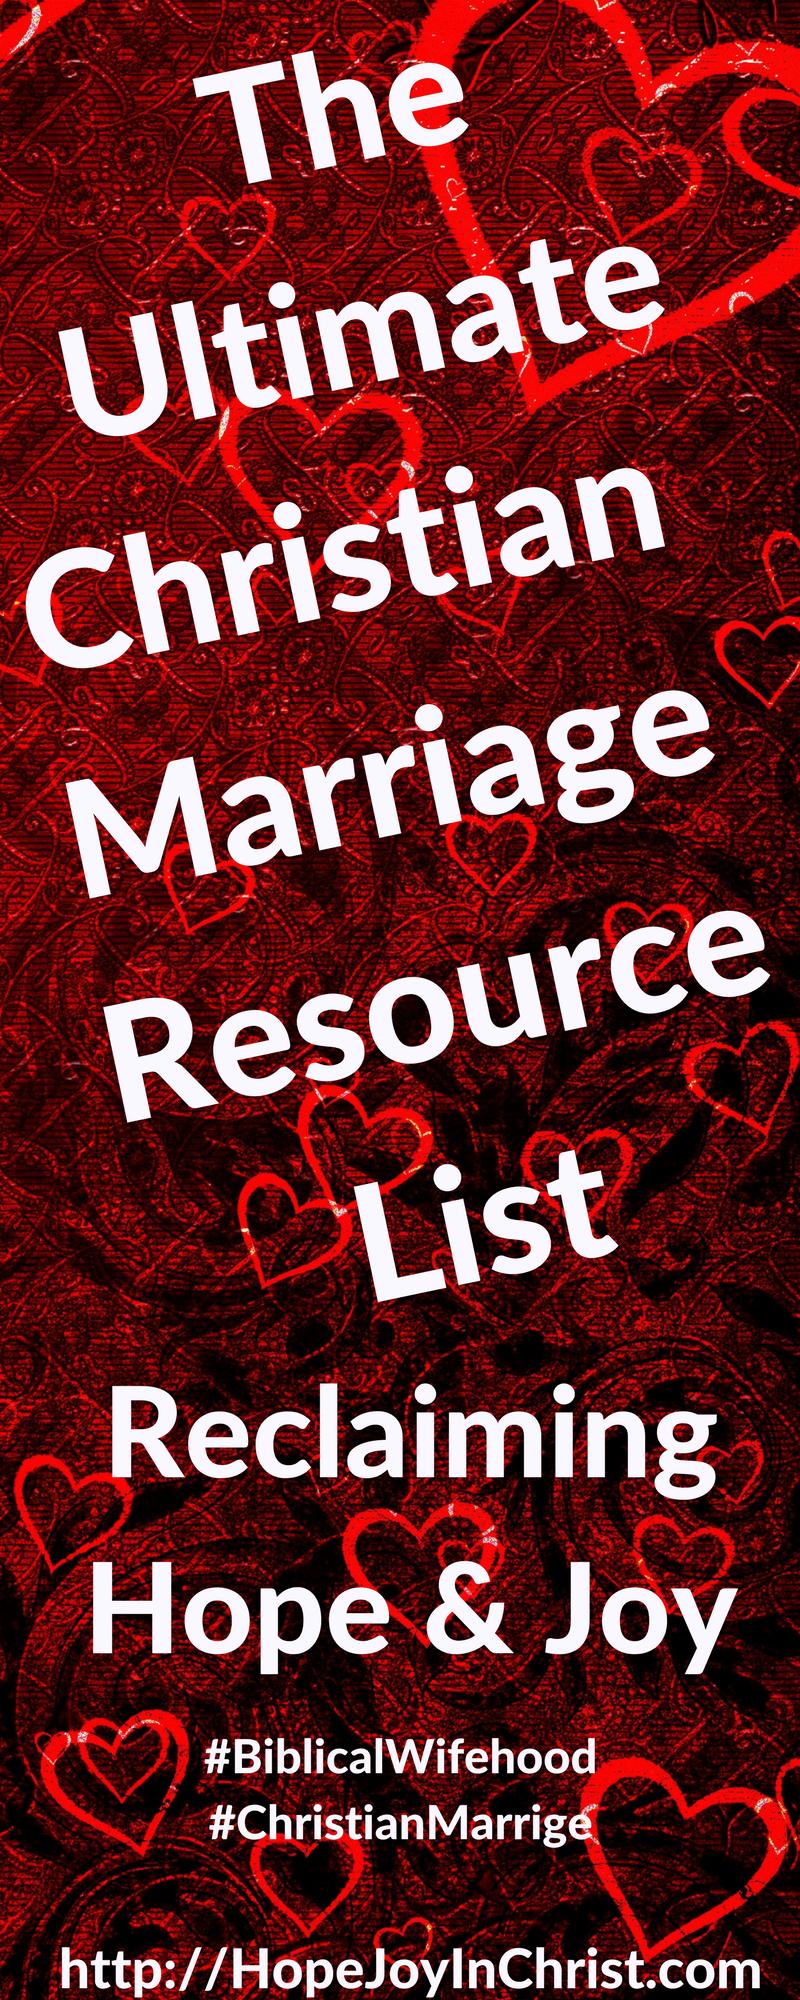 The Ultimate Christian Marriage Resource List for Reclaiming Hope & Joy (#BiblicalWifehood)